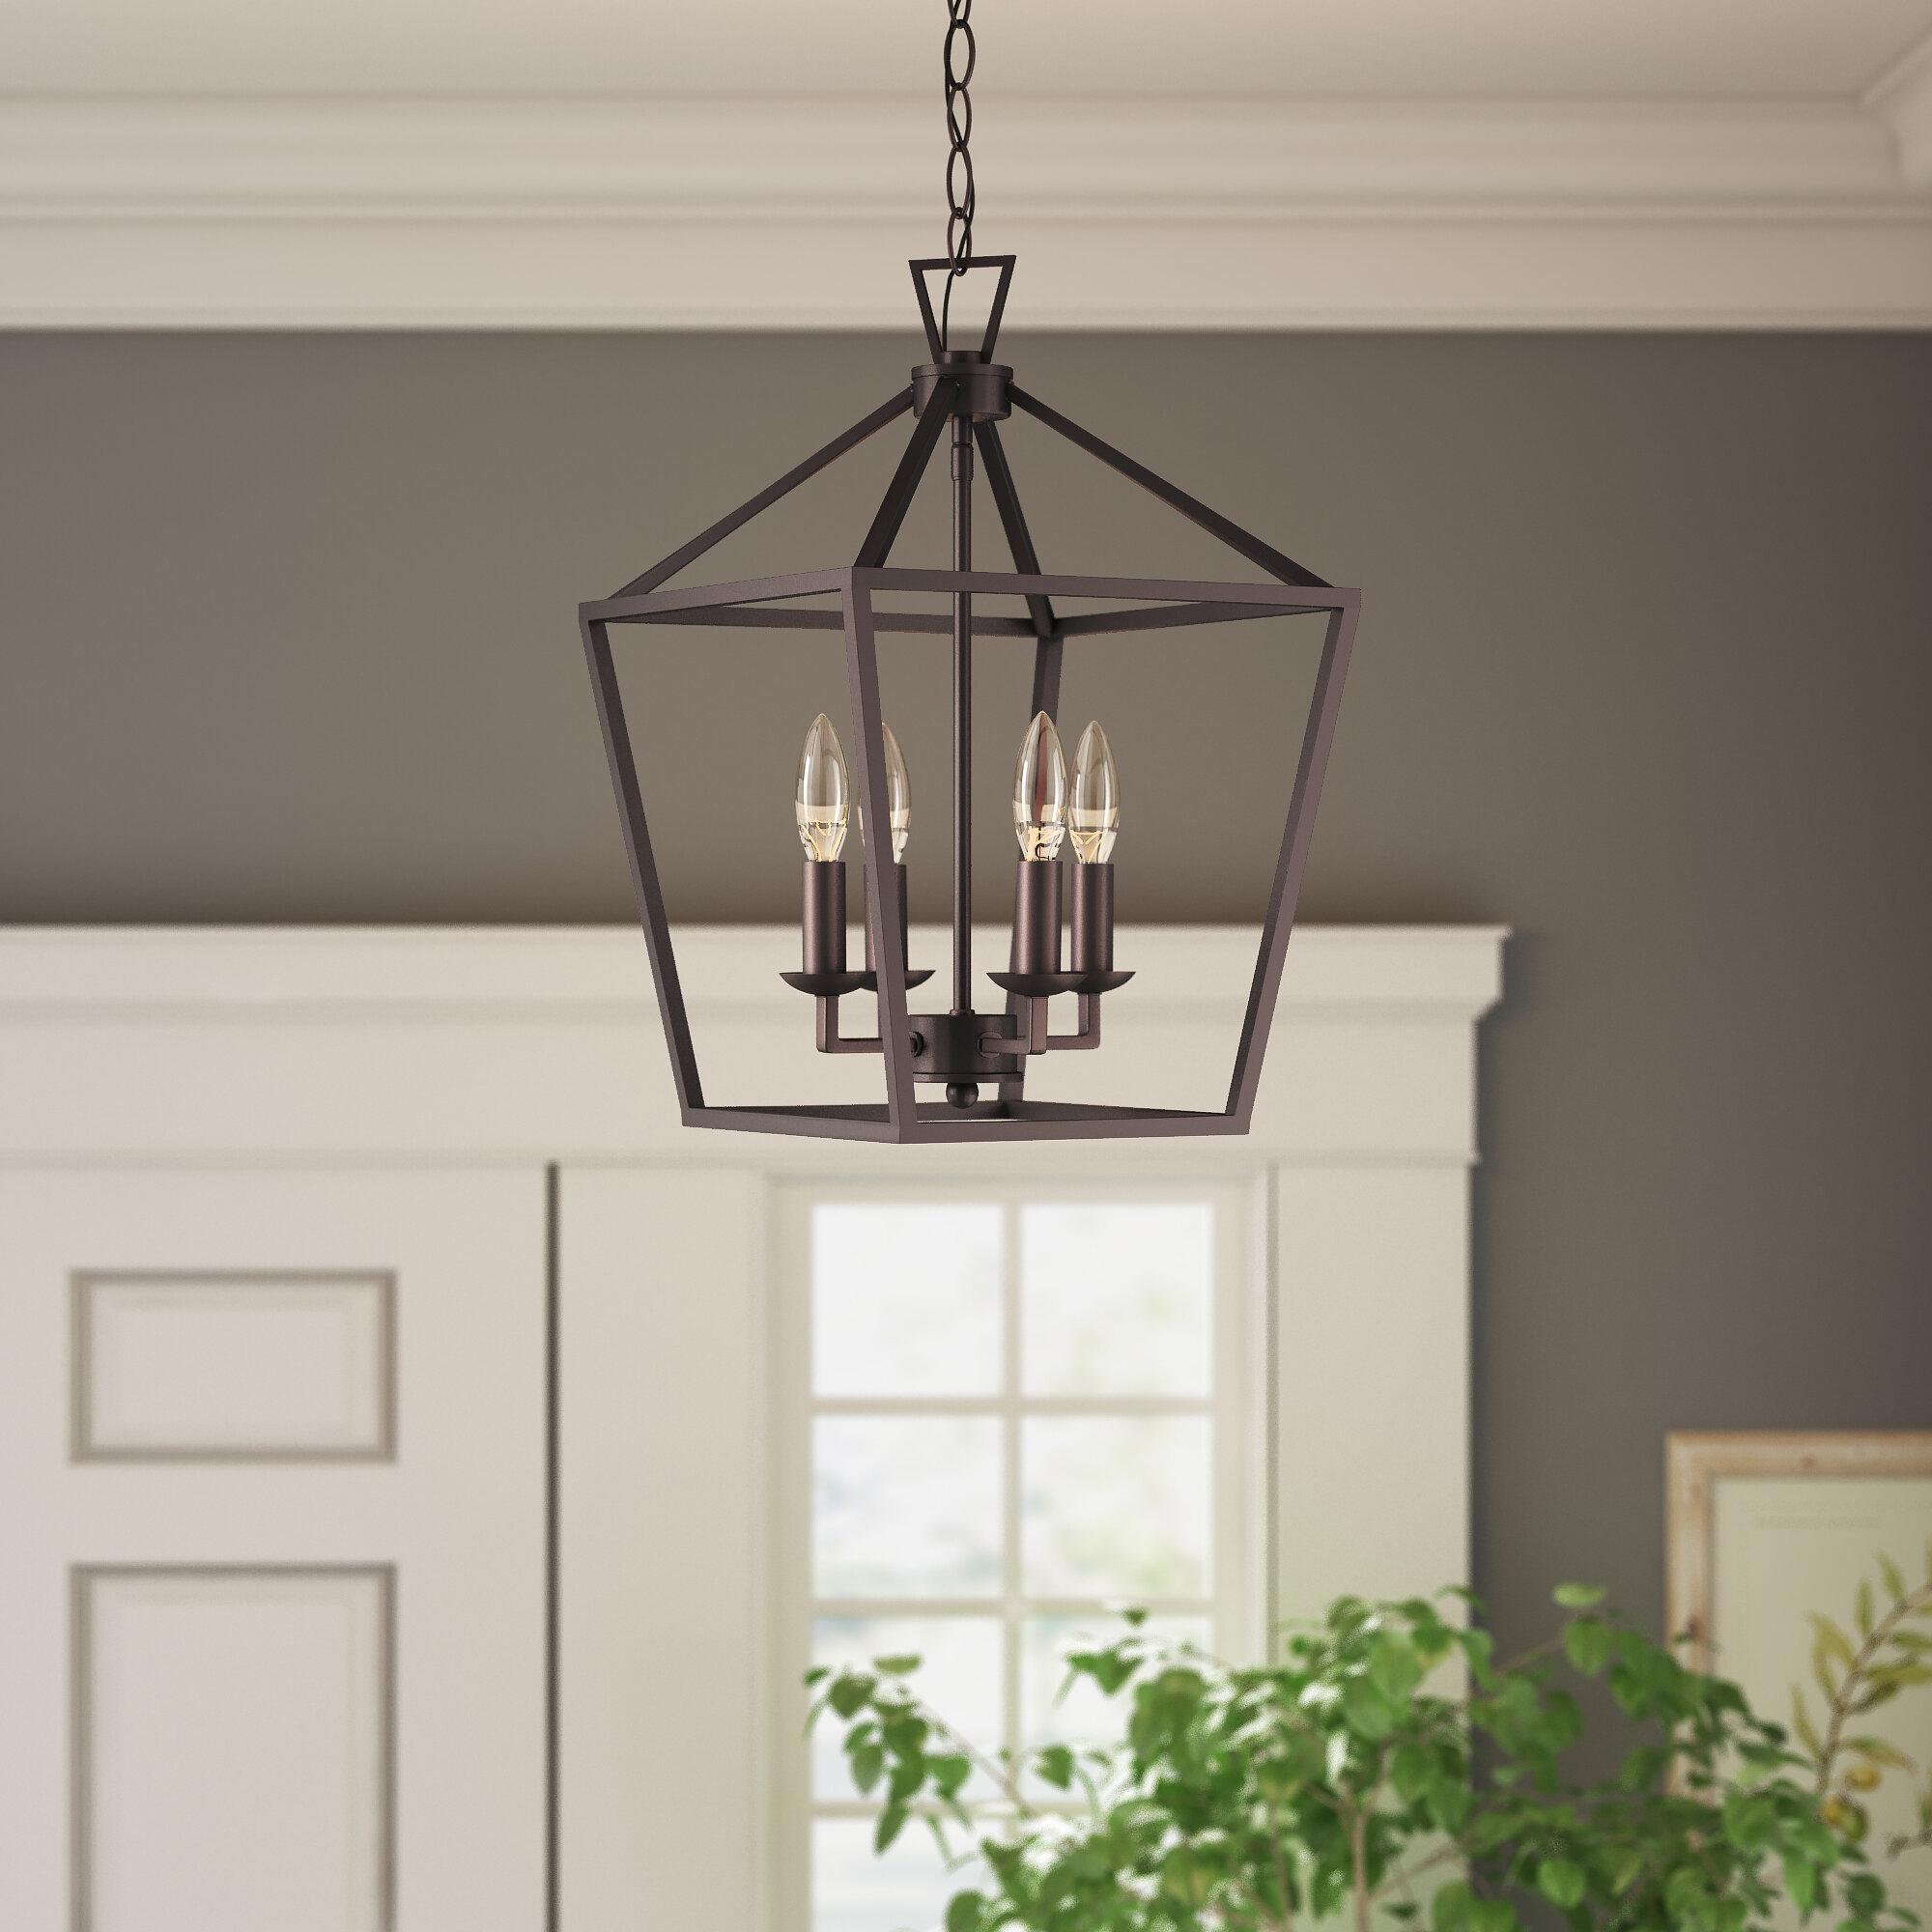 Farmhouse & Rustic Foyer Pendants | Birch Lane Pertaining To Warner Robins 3 Light Lantern Pendants (View 14 of 30)